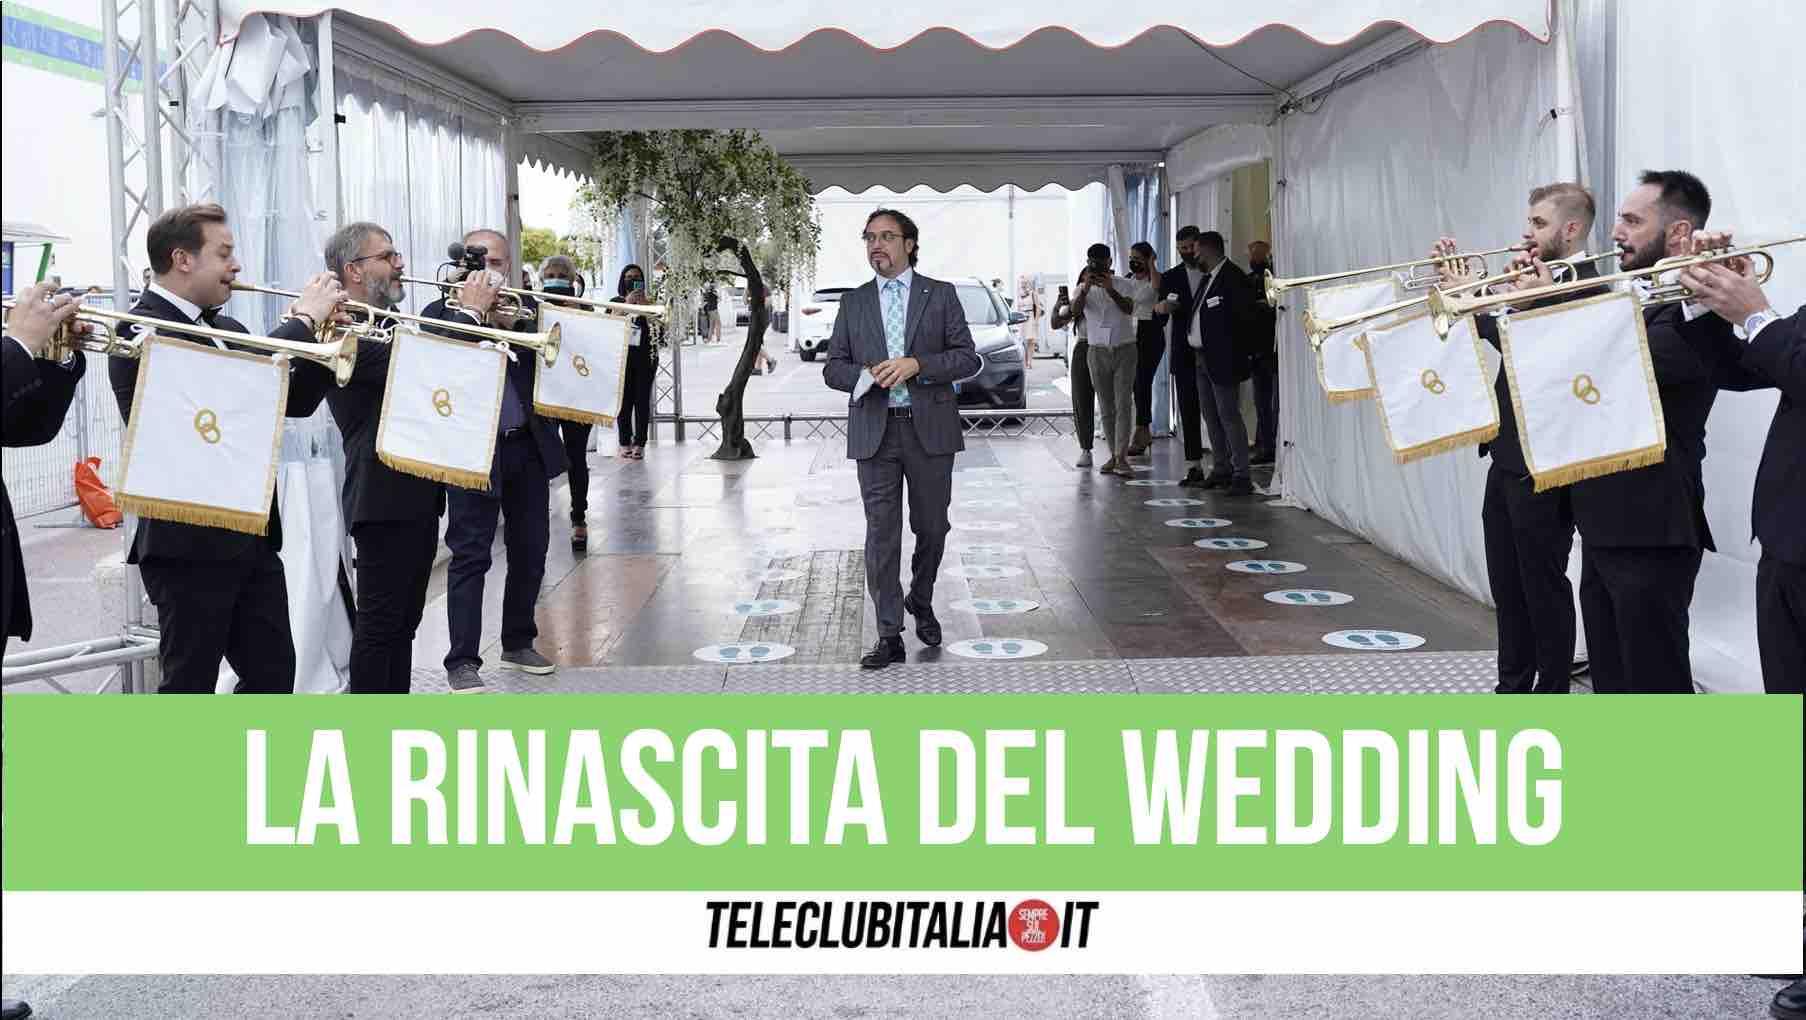 mia sposa wedding sposi fiera marìcan marcello damiano